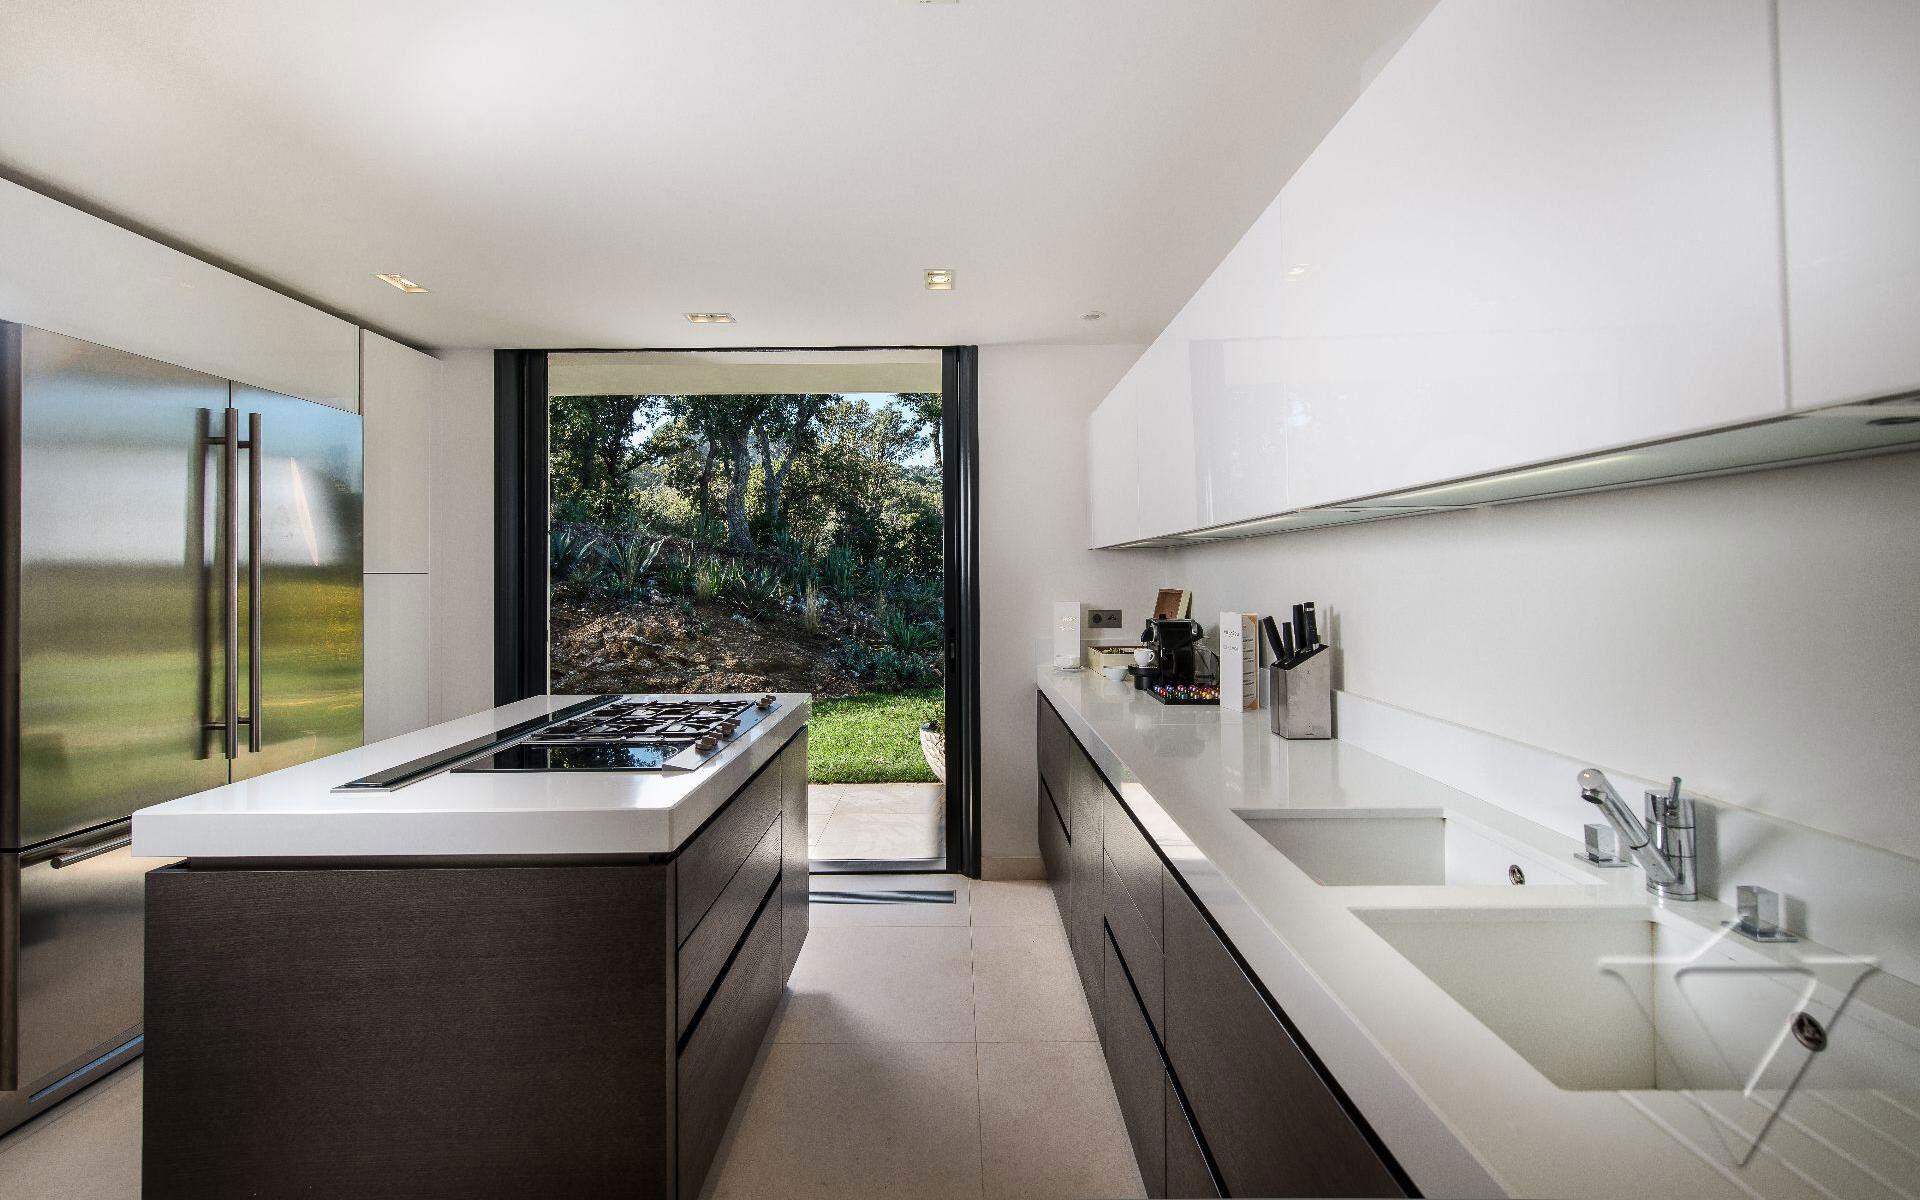 Kitchen Island, Luxury Holiday Villa in Saint-Tropez, France